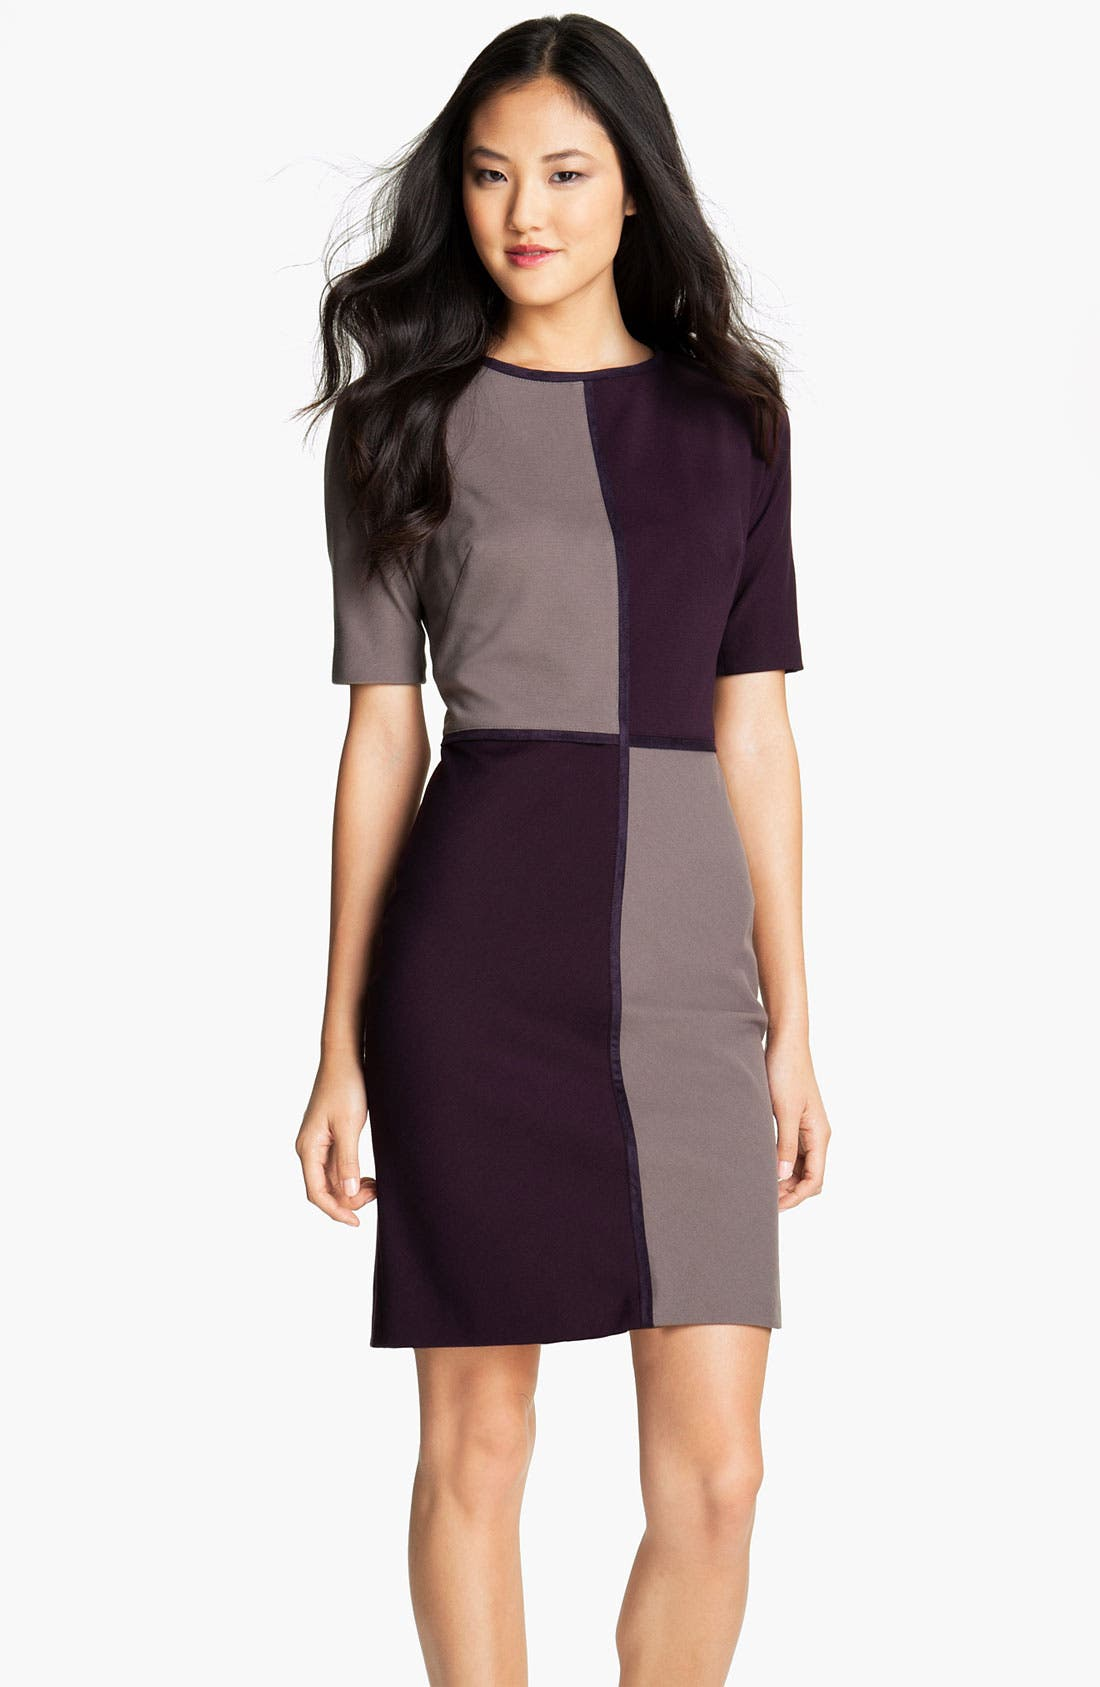 Alternate Image 1 Selected - Suzi Chin for Maggy Boutique Colorblock Sheath Dress (Petite)